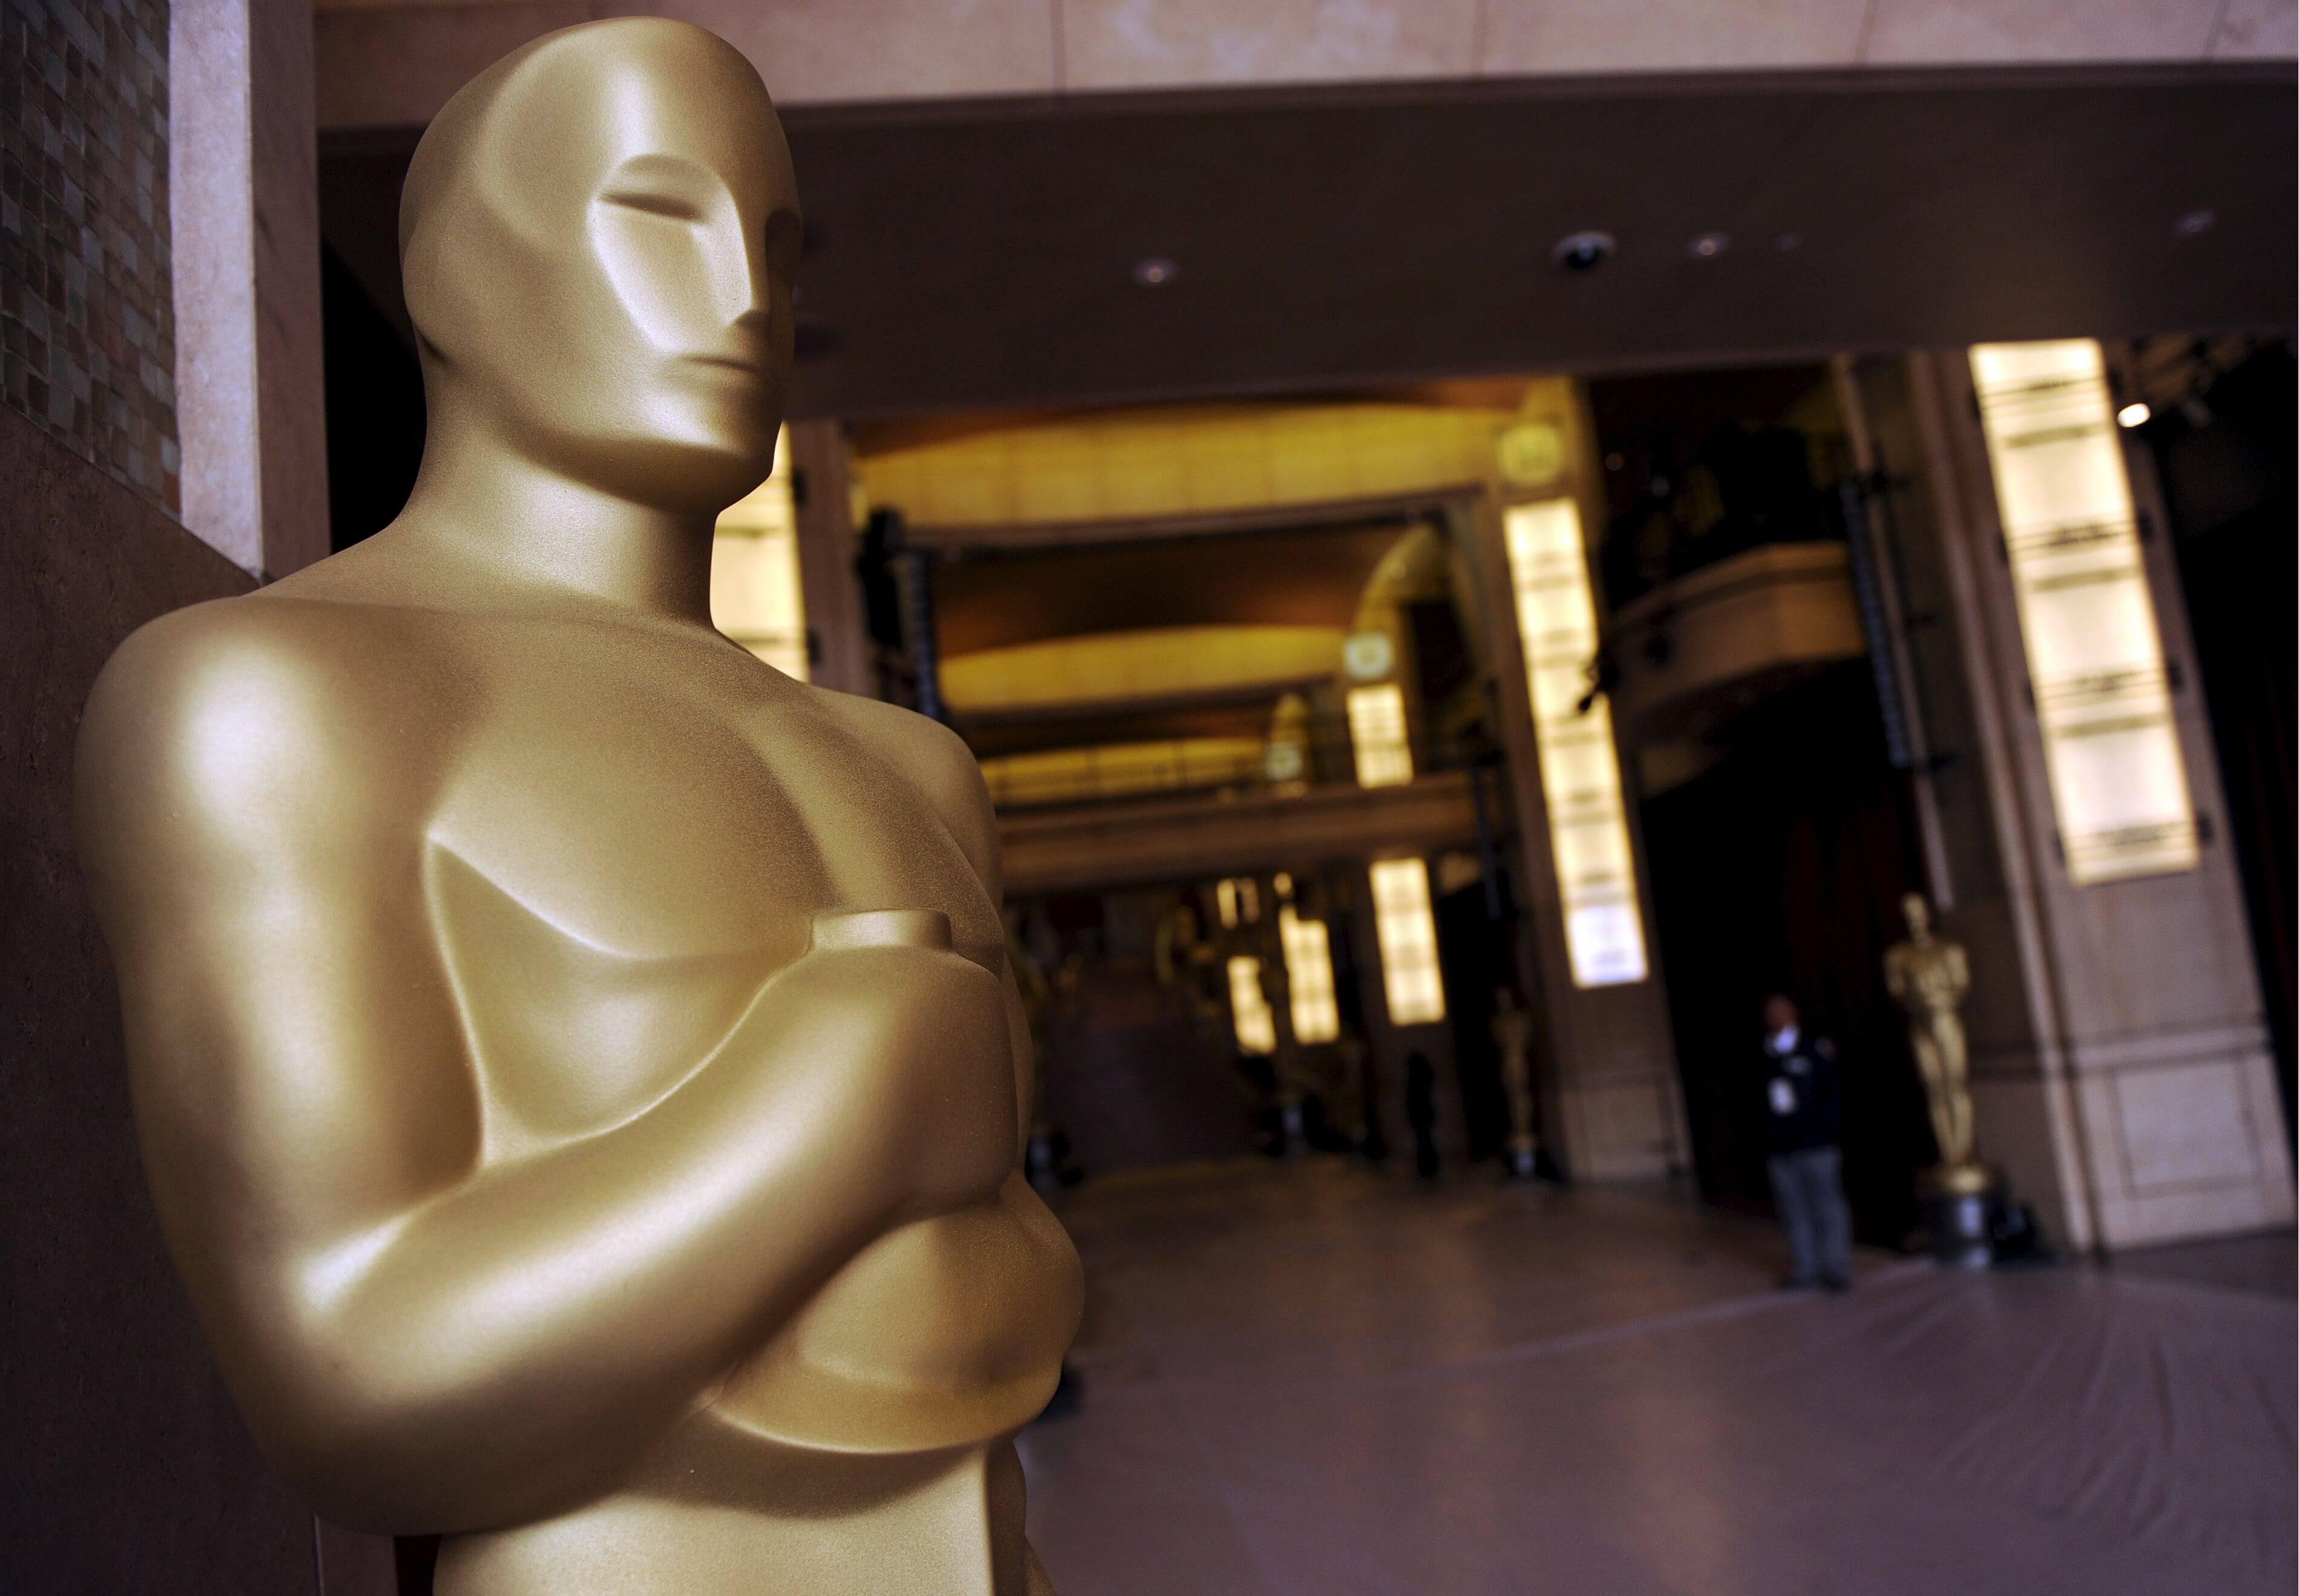 The 15 Best Oscar Jokes of All Time